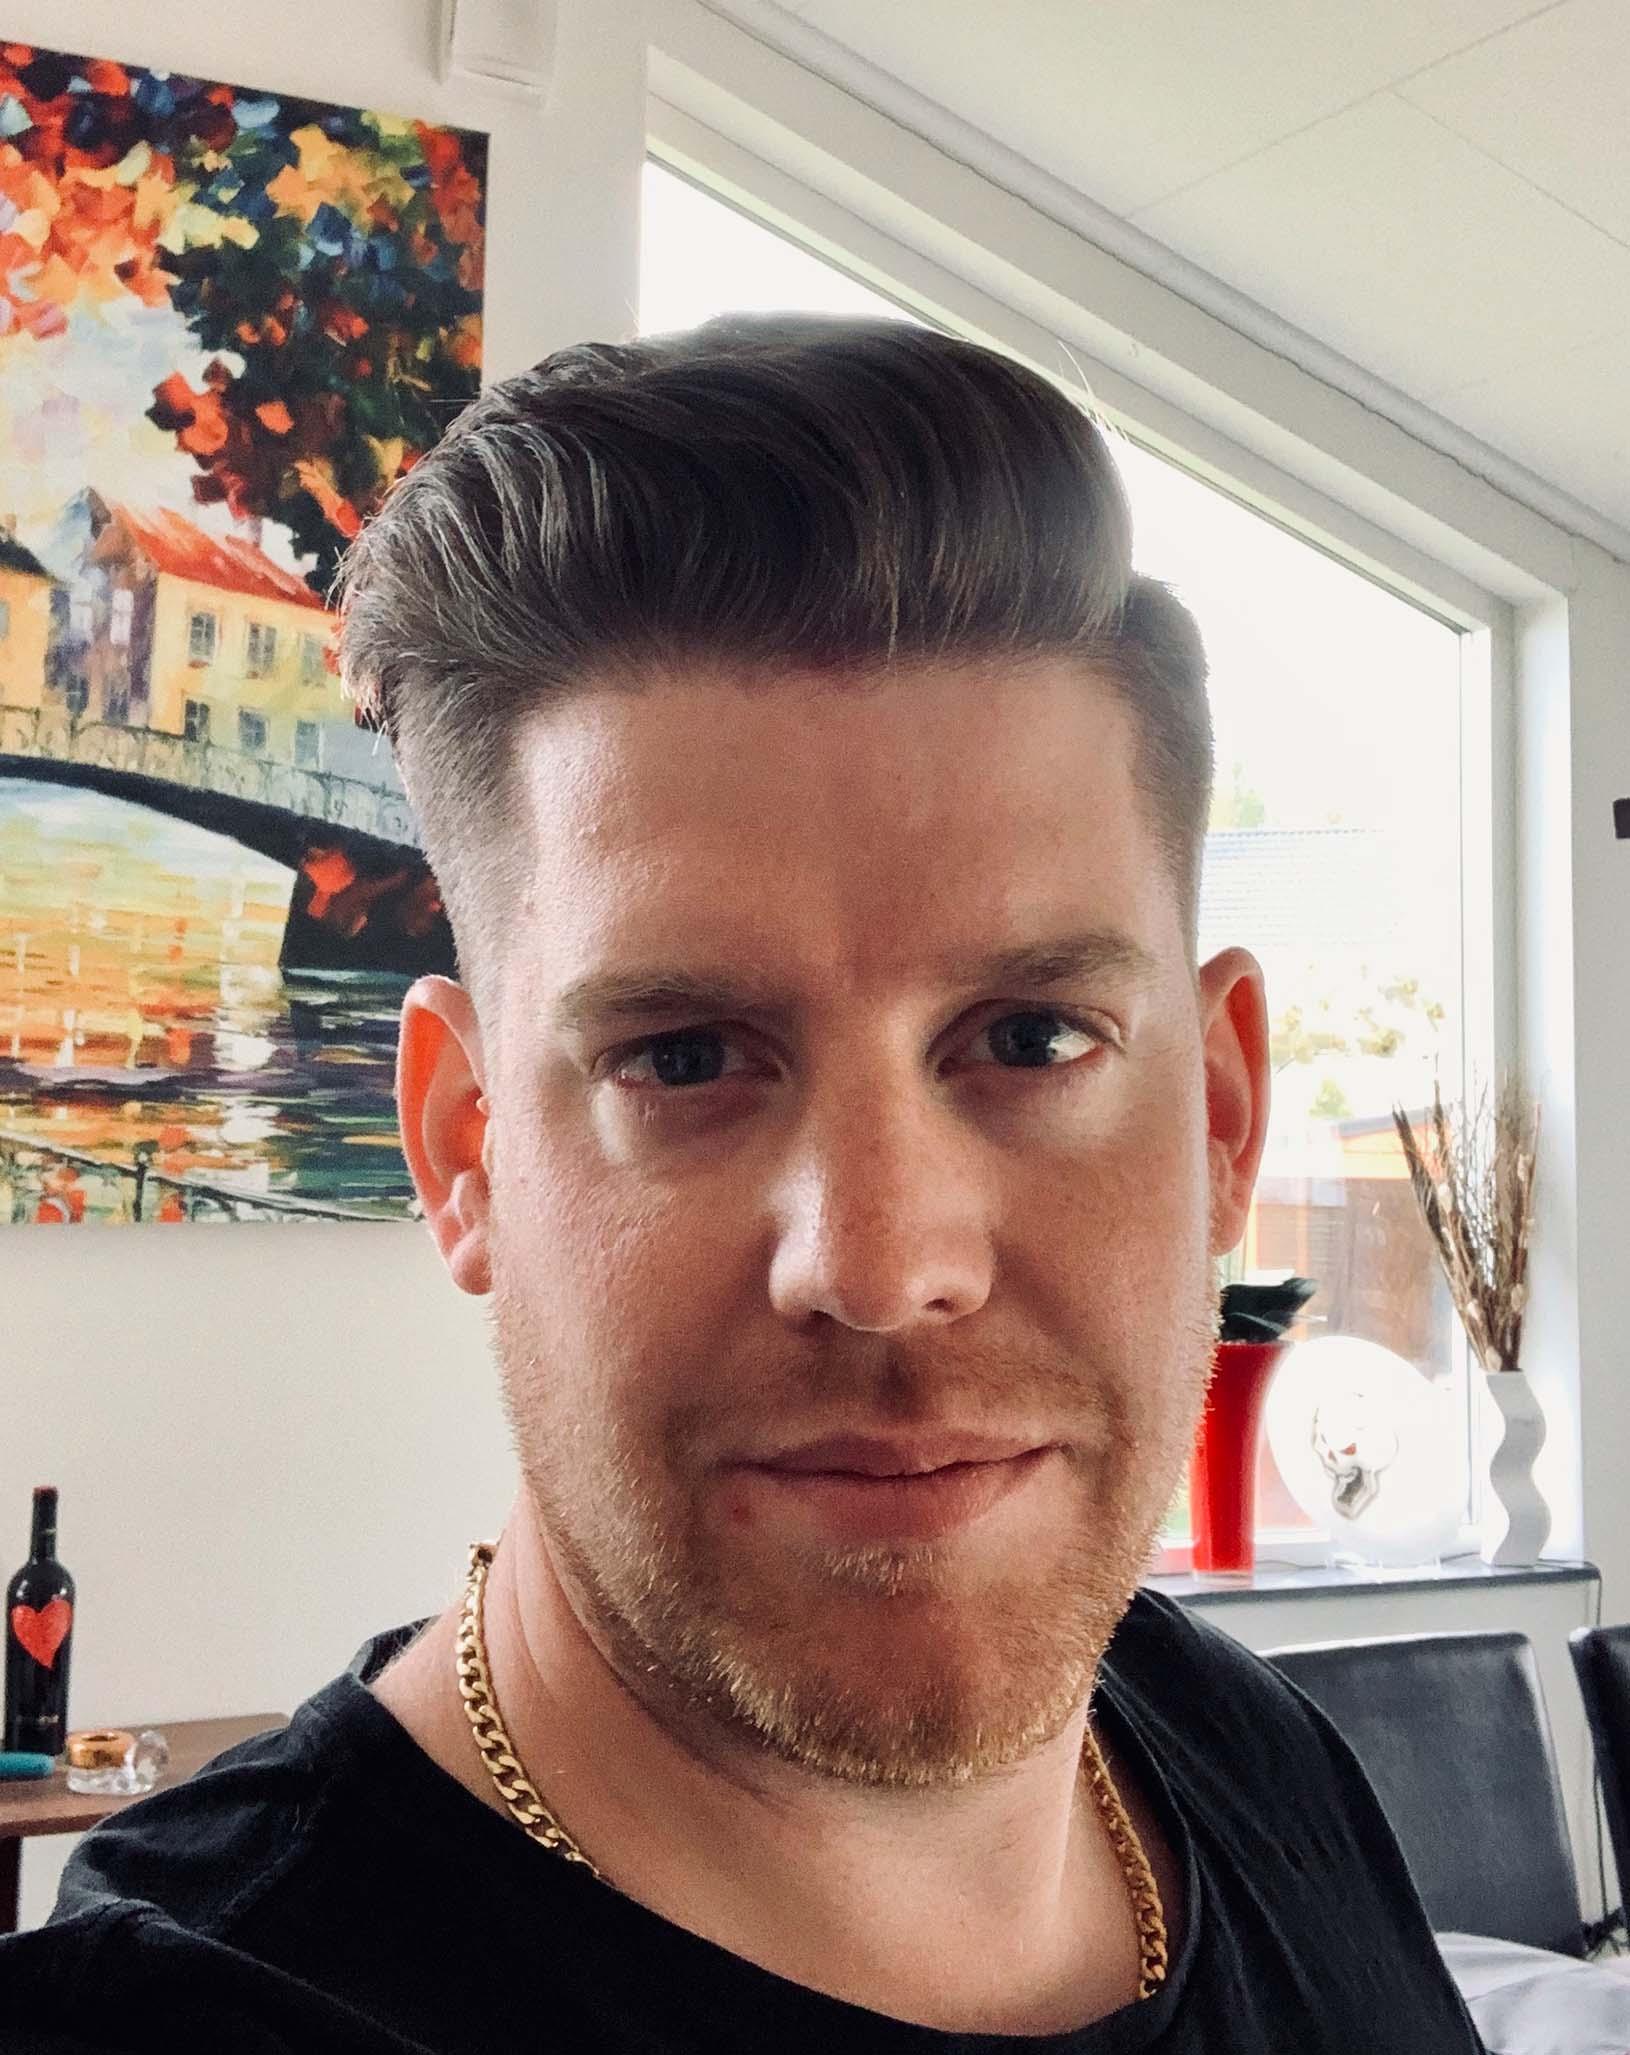 Marcus Lindblom Amsler Hiss